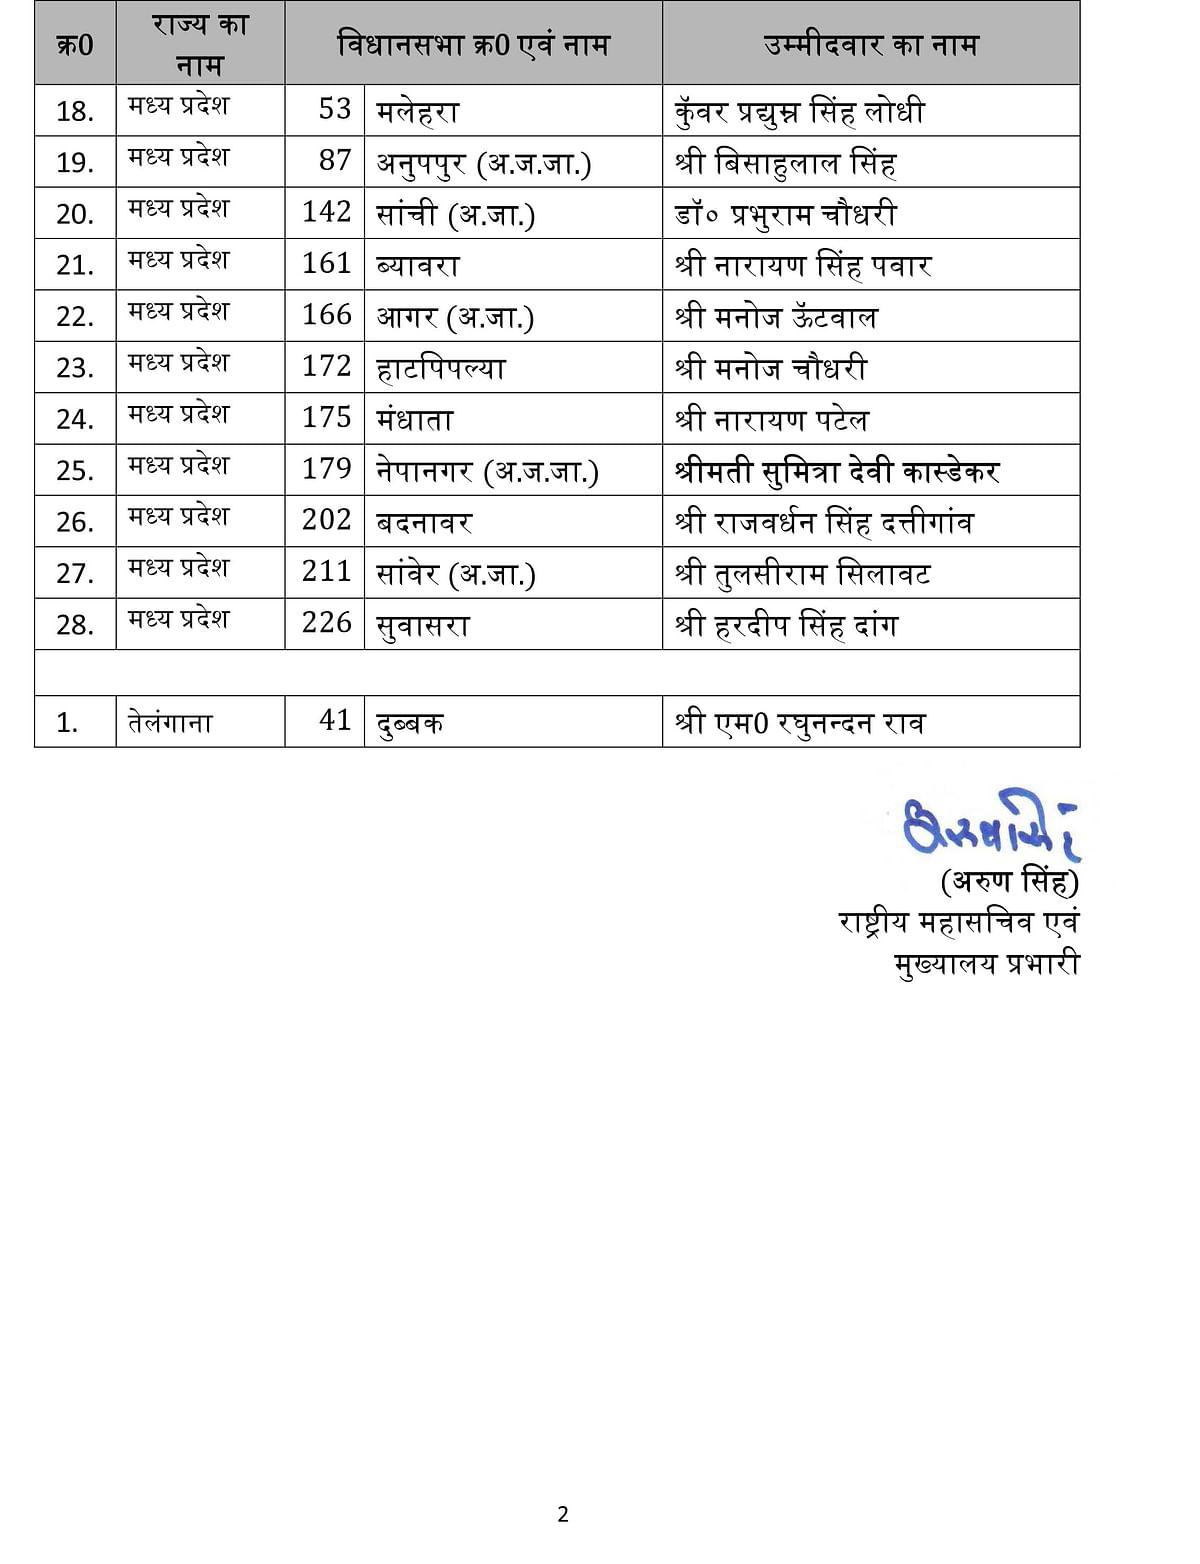 Madhya Pradesh bypolls: BJP announces candidates for 28 seats